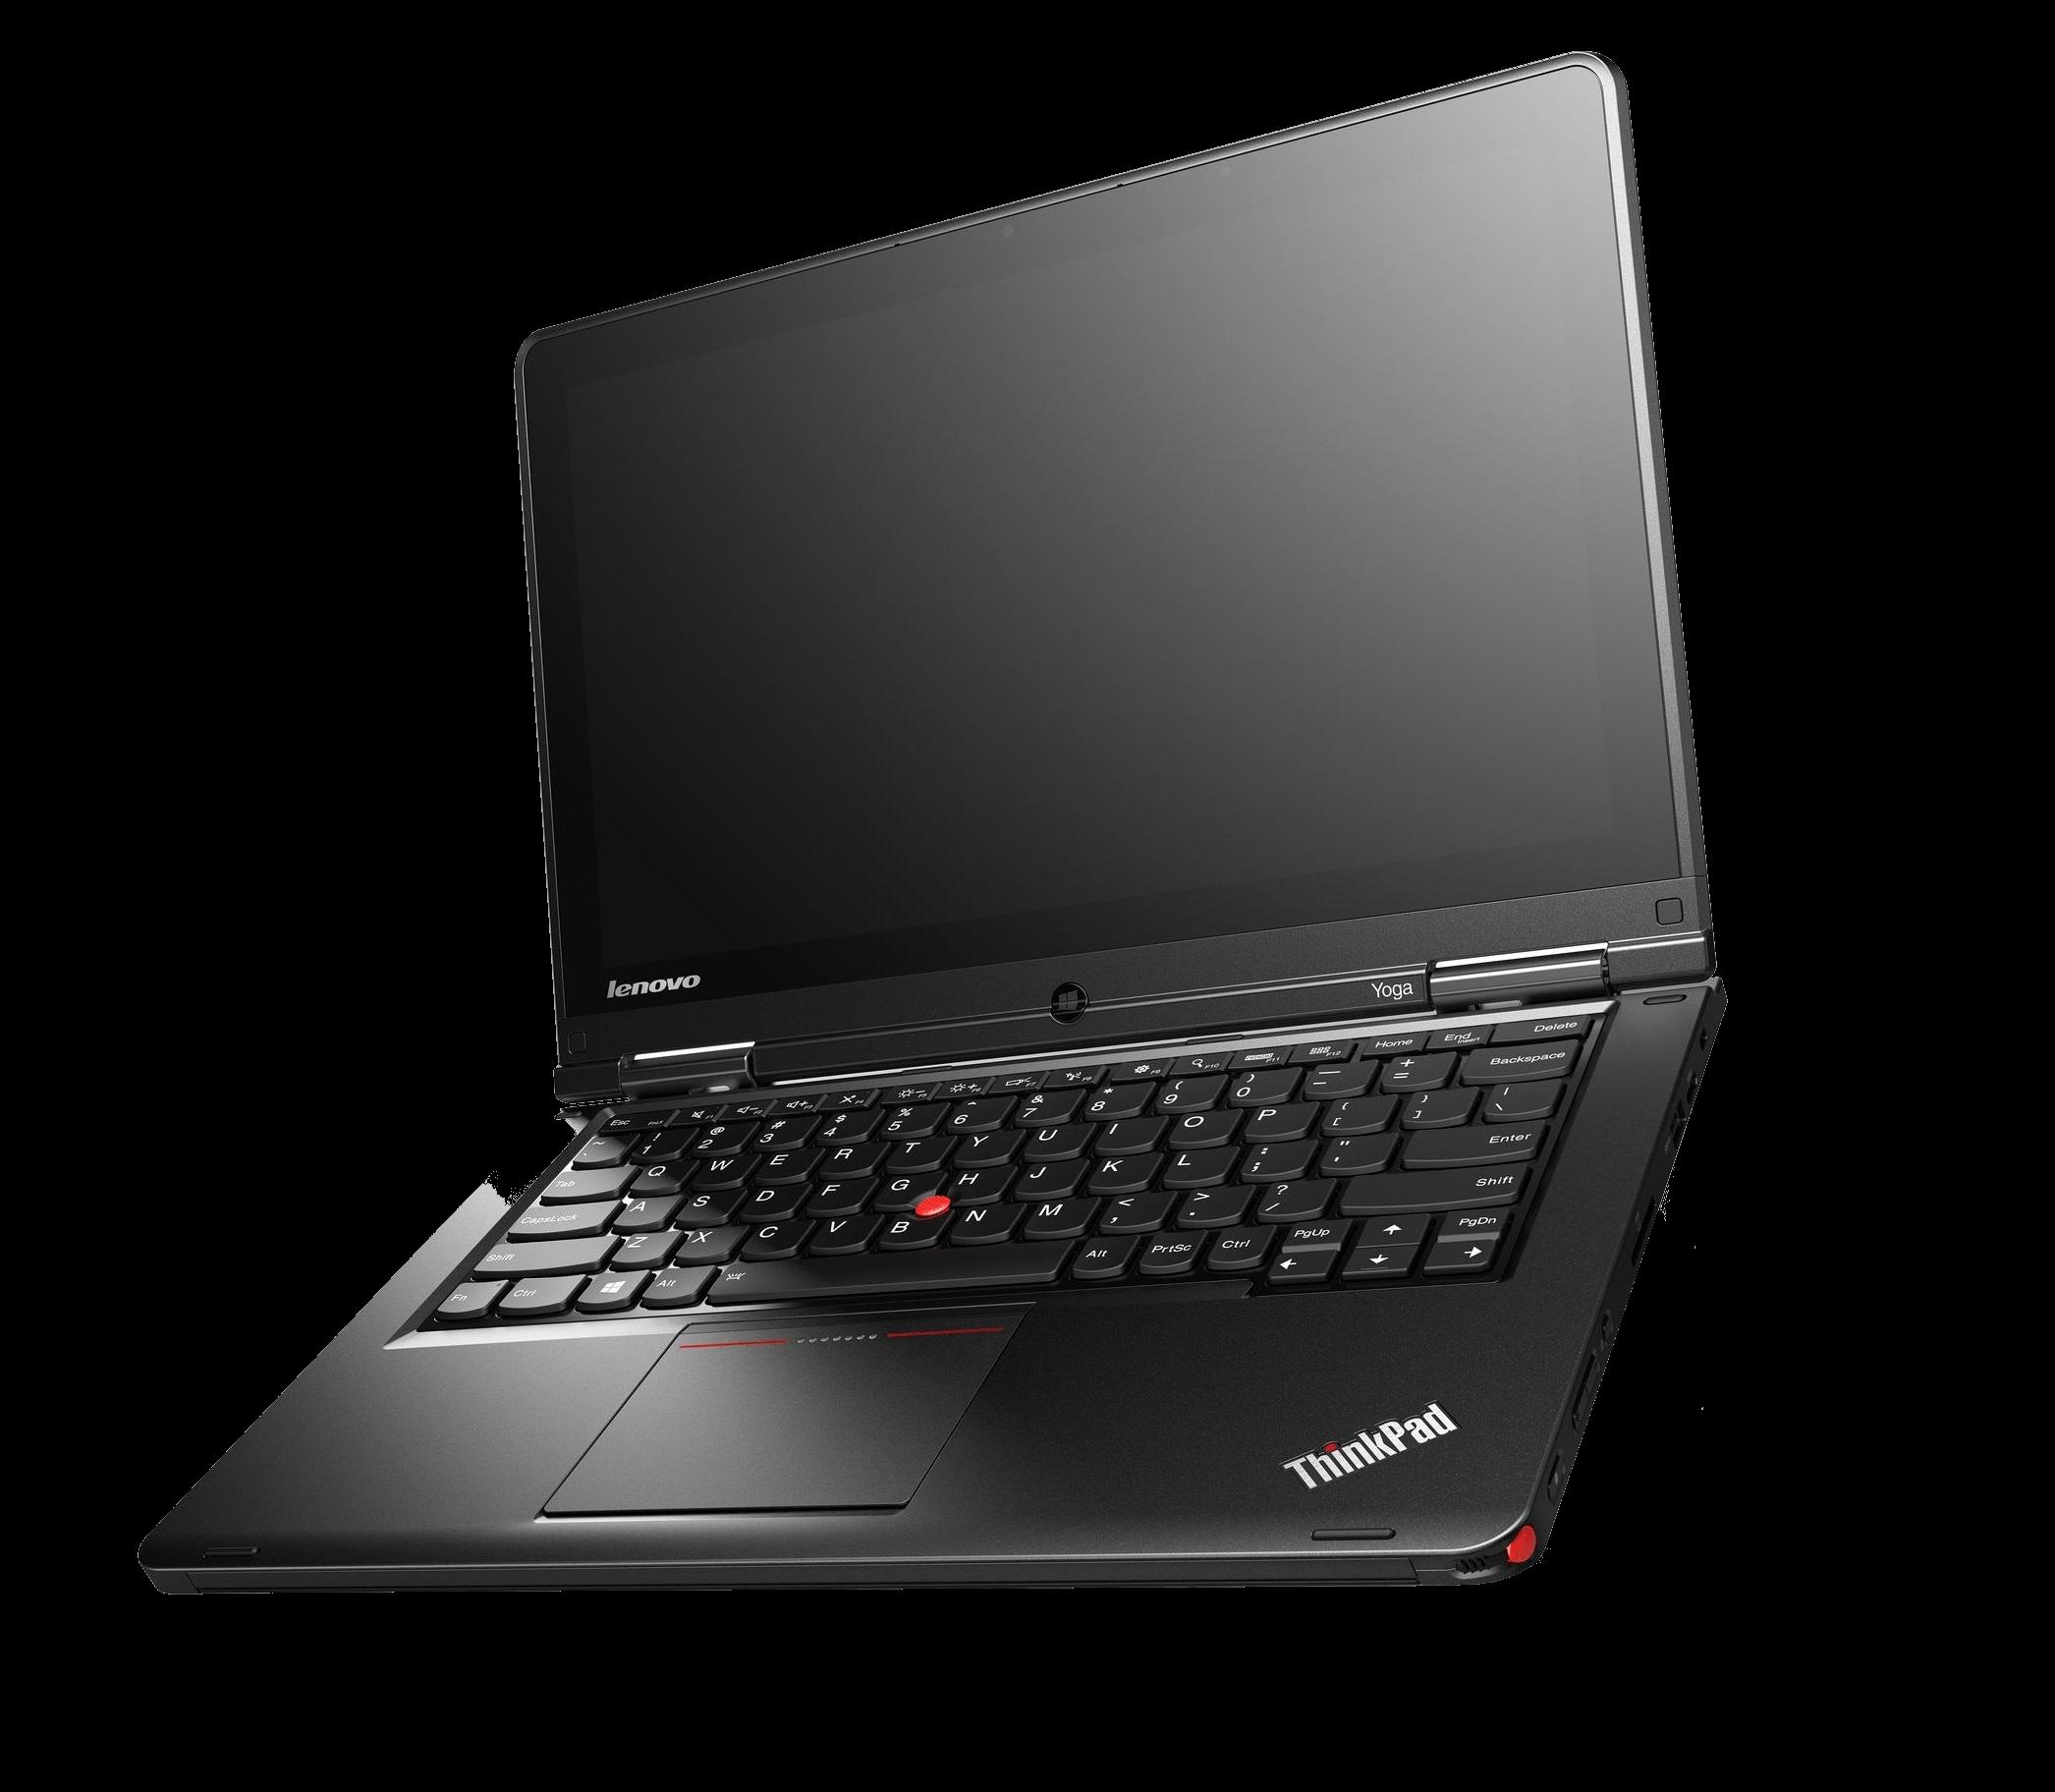 Lenovo ThinkPad Yoga 20DK0-02E